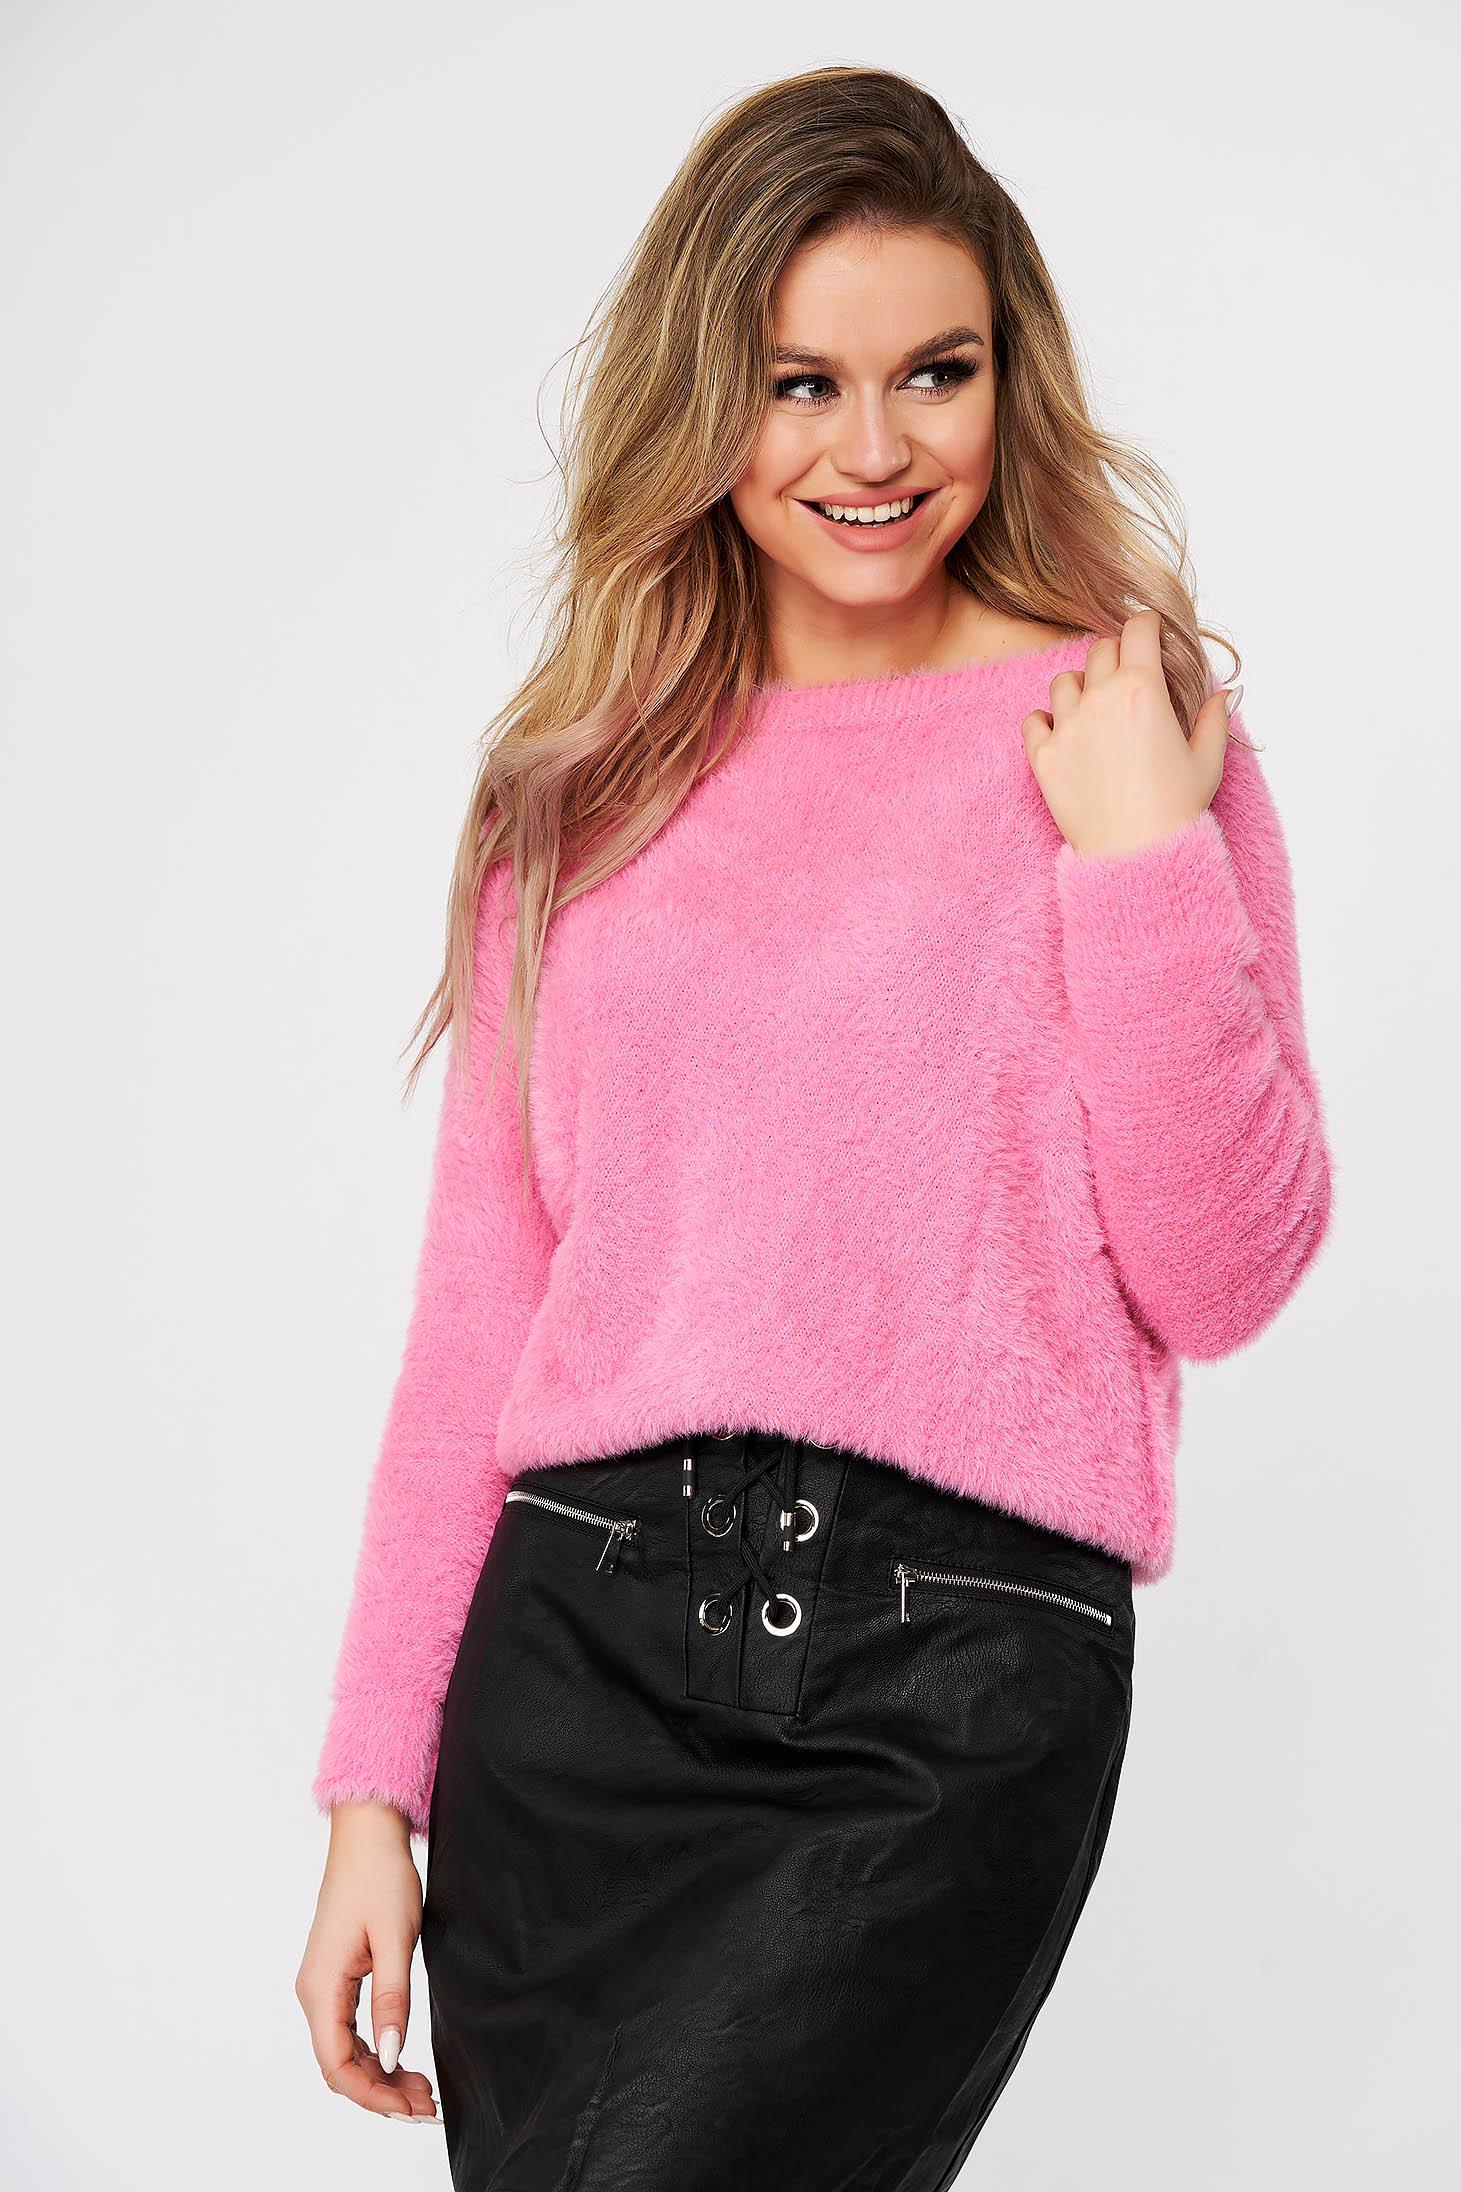 Pulover SunShine roz casual din material pufos tricotat cu croi larg